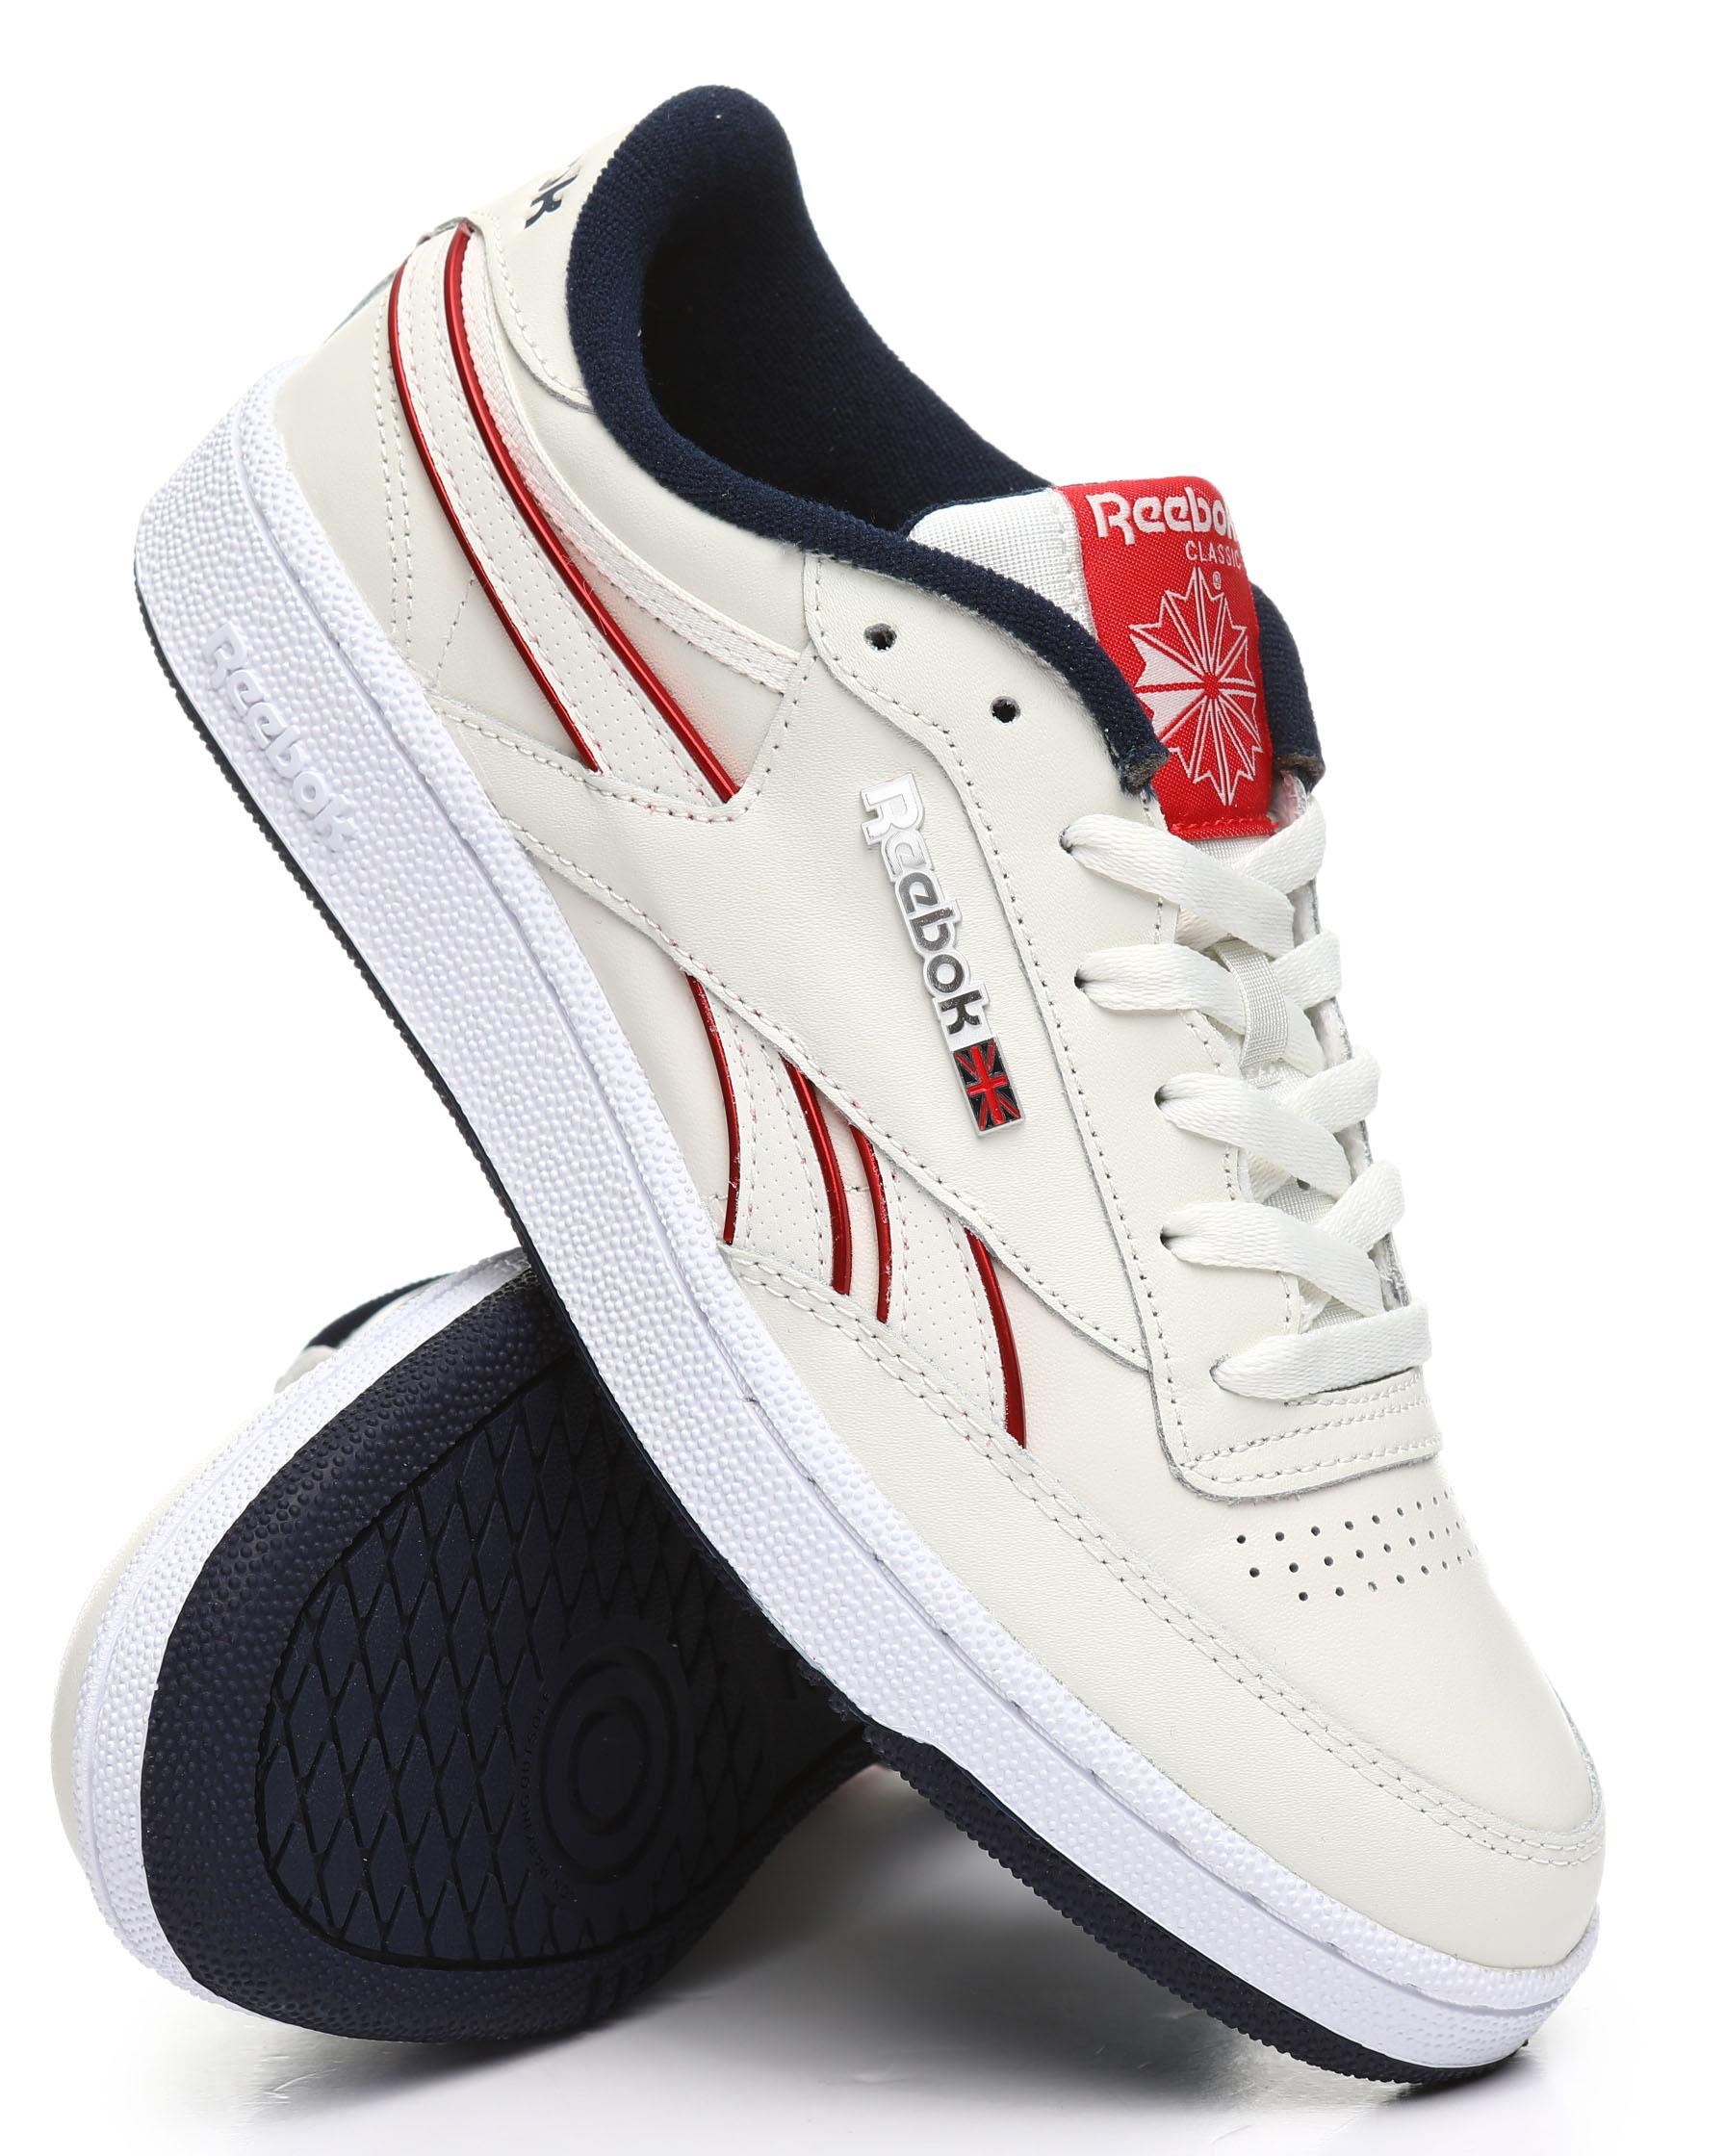 Buy Club C Revenge MU Sneakers Men's Footwear from Reebok